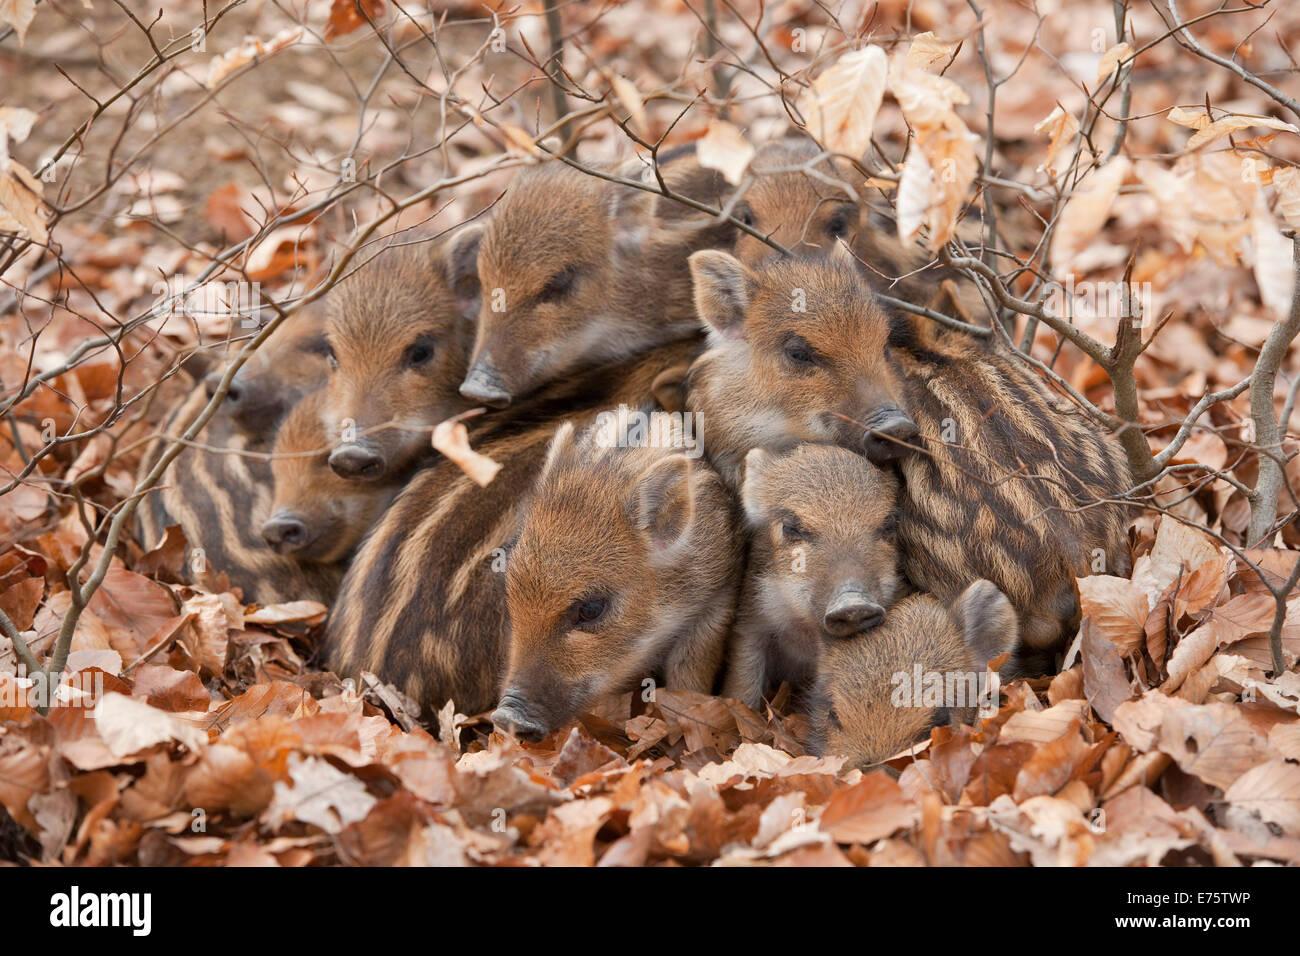 Wild Boars (Sus scrofa), piglets warming each other, captive, North Rhine-Westphalia, Germany - Stock Image